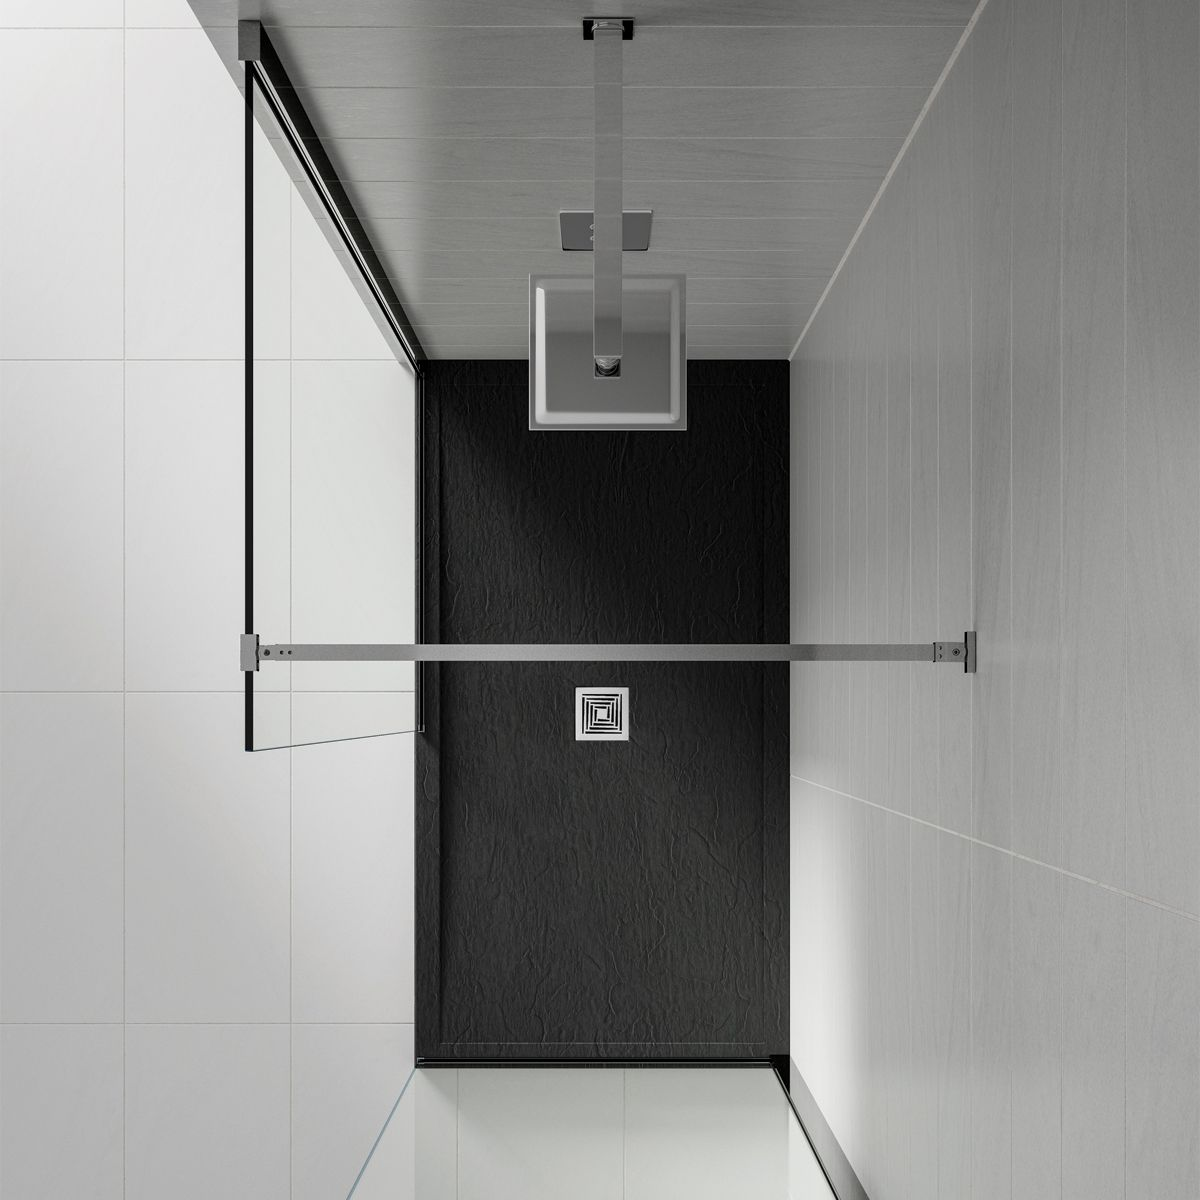 Aquadart Black Slate Shower Tray 1000 x 900 Overhead